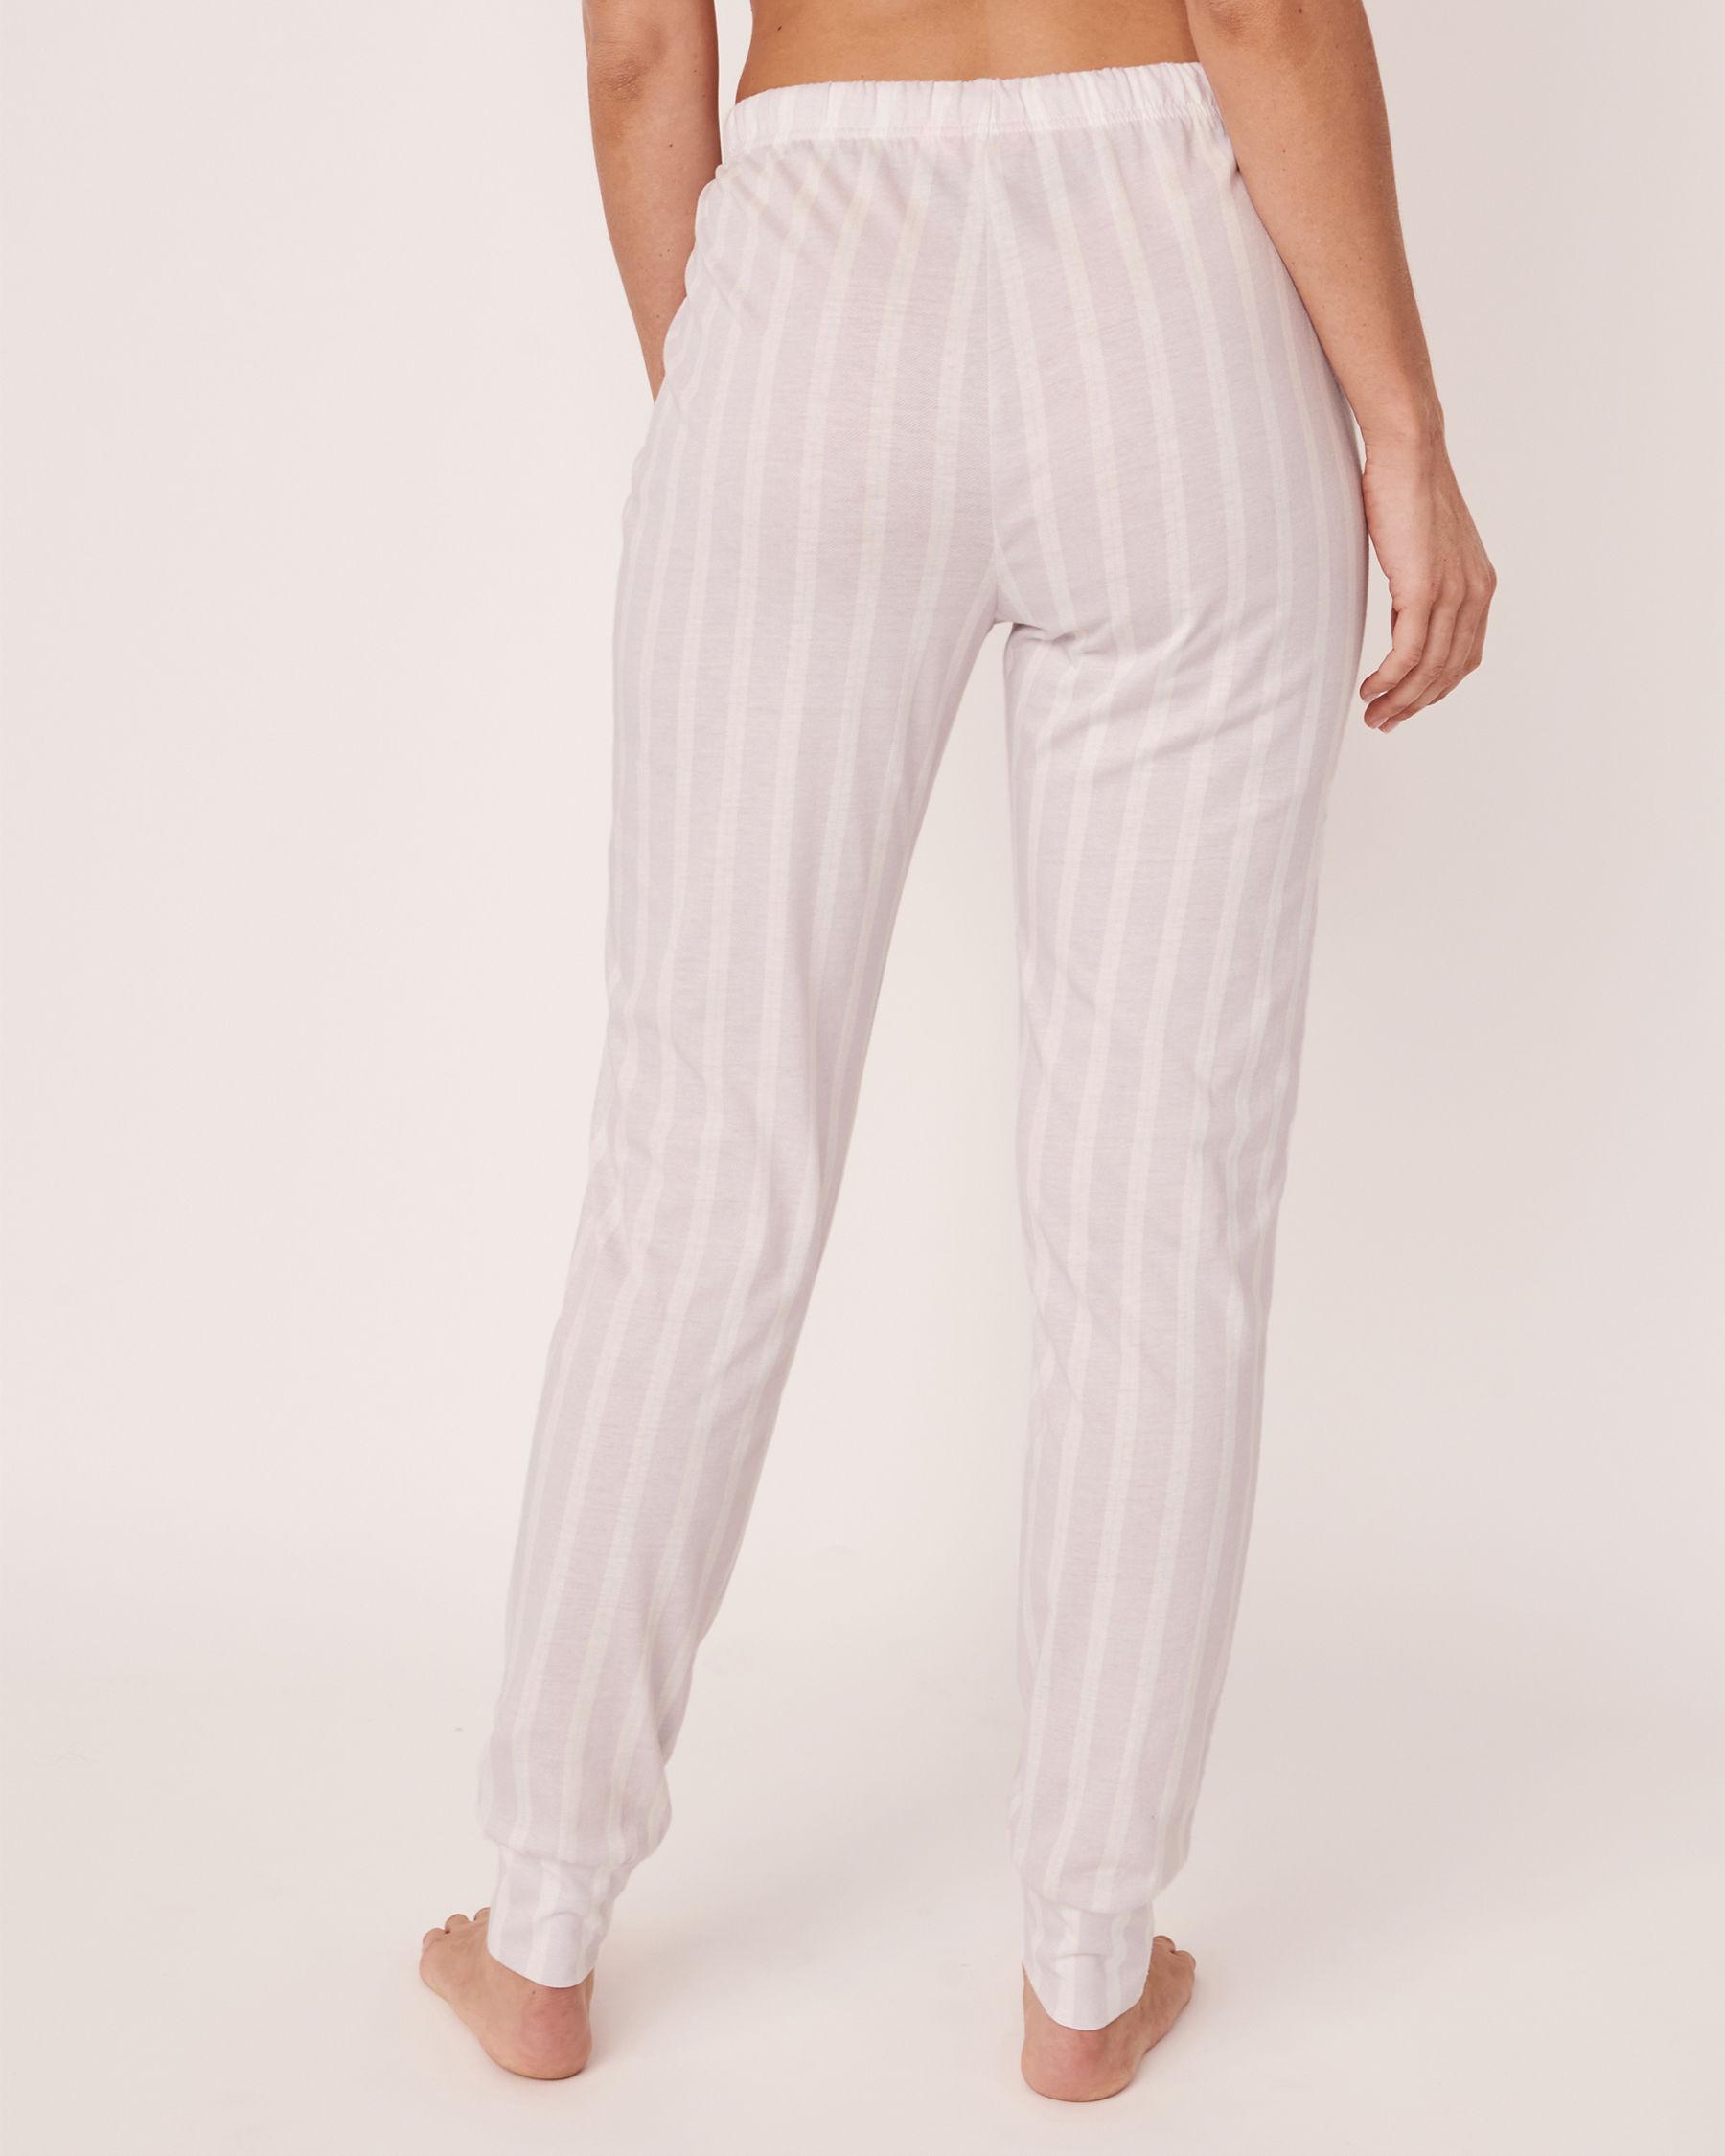 LA VIE EN ROSE Fitted Pyjama Pant Stripes 40200157 - View2